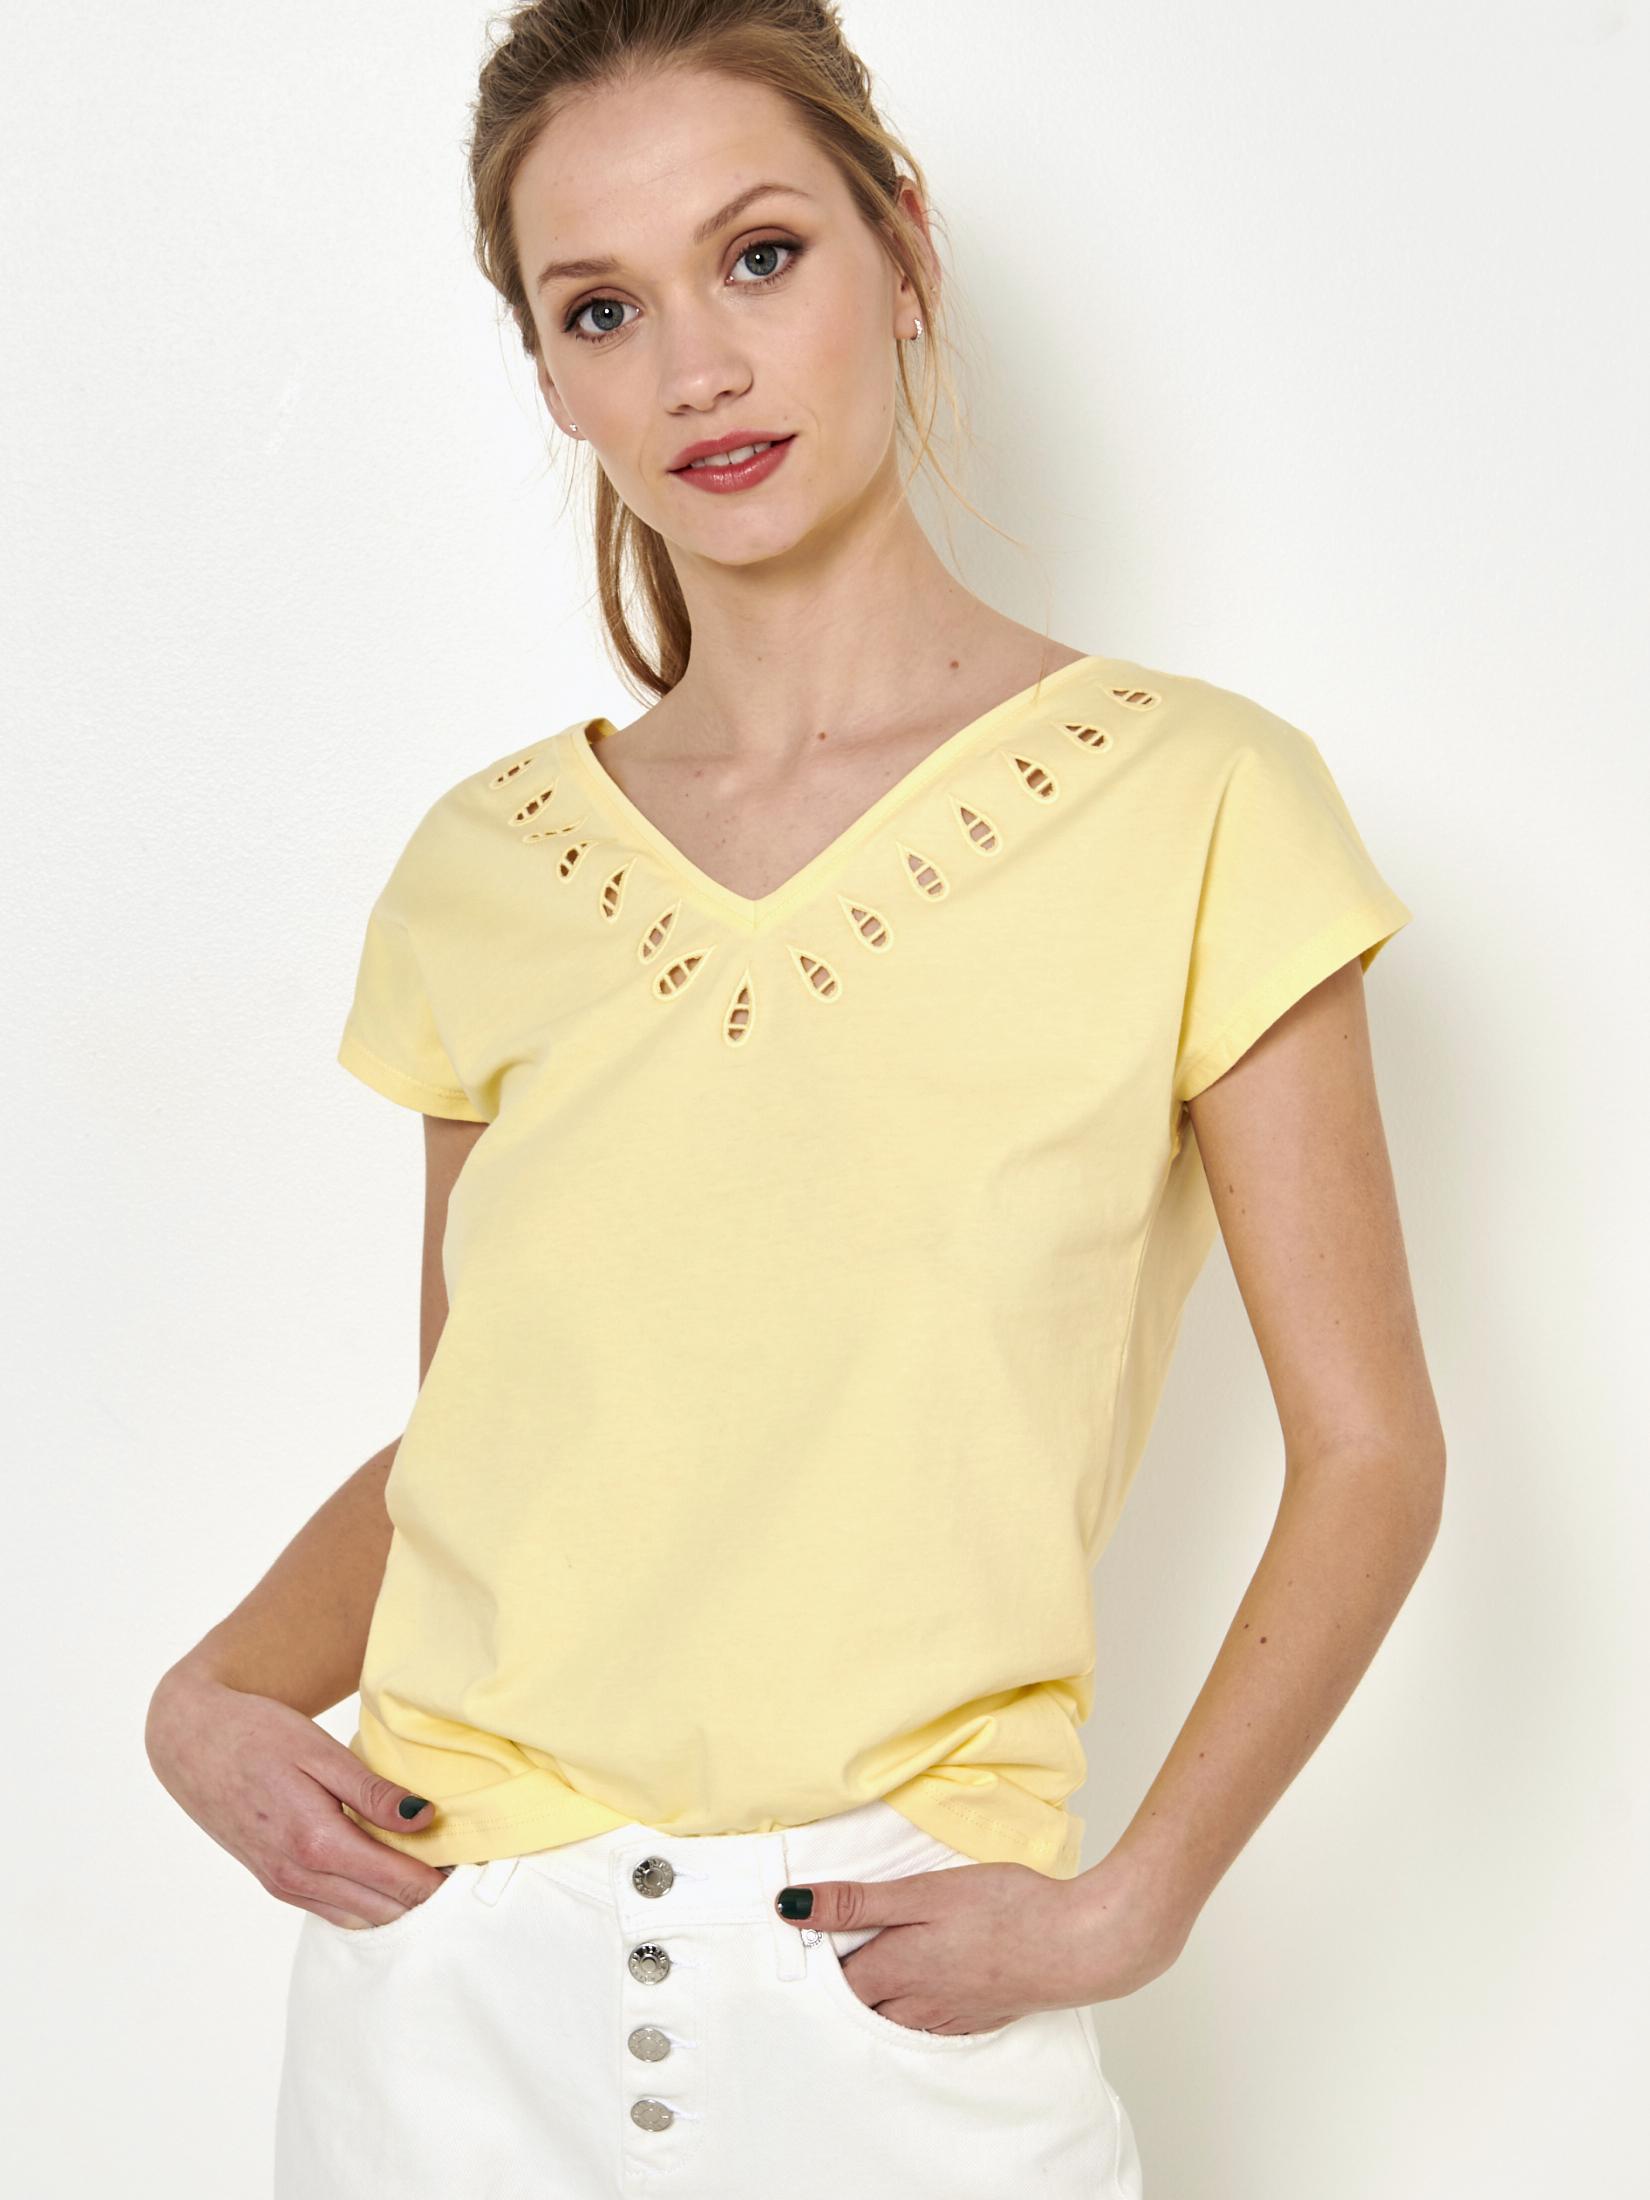 Topuri pentru femei CAMAIEU - galben